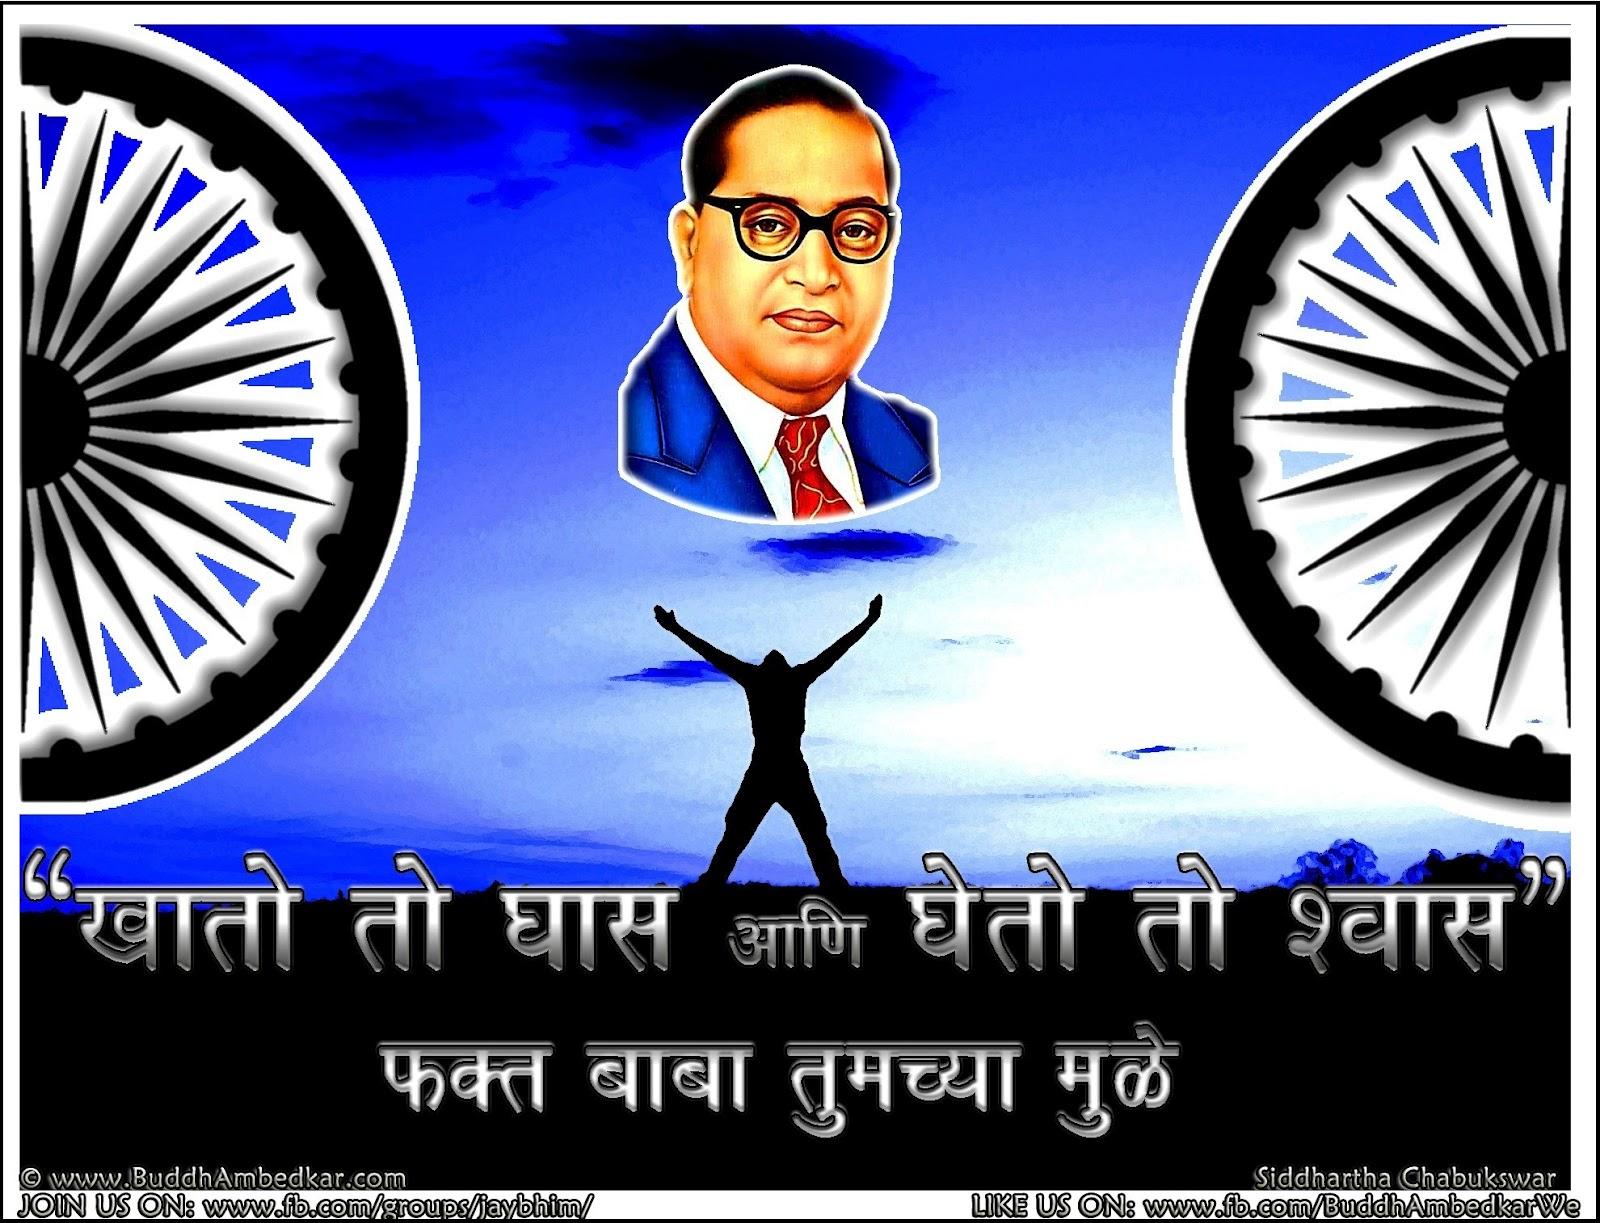 http://1.bp.blogspot.com/-XRH0SC4vDcY/UFq50NVwImI/AAAAAAAAELQ/hO63Ji1us6E/s1600/Babasaheb+Ambedkar+wallpaper+marathi+quote+HD+B+R+Ambedkar+Jay+Bhim+Siddhartha+Chabukswar.jpg